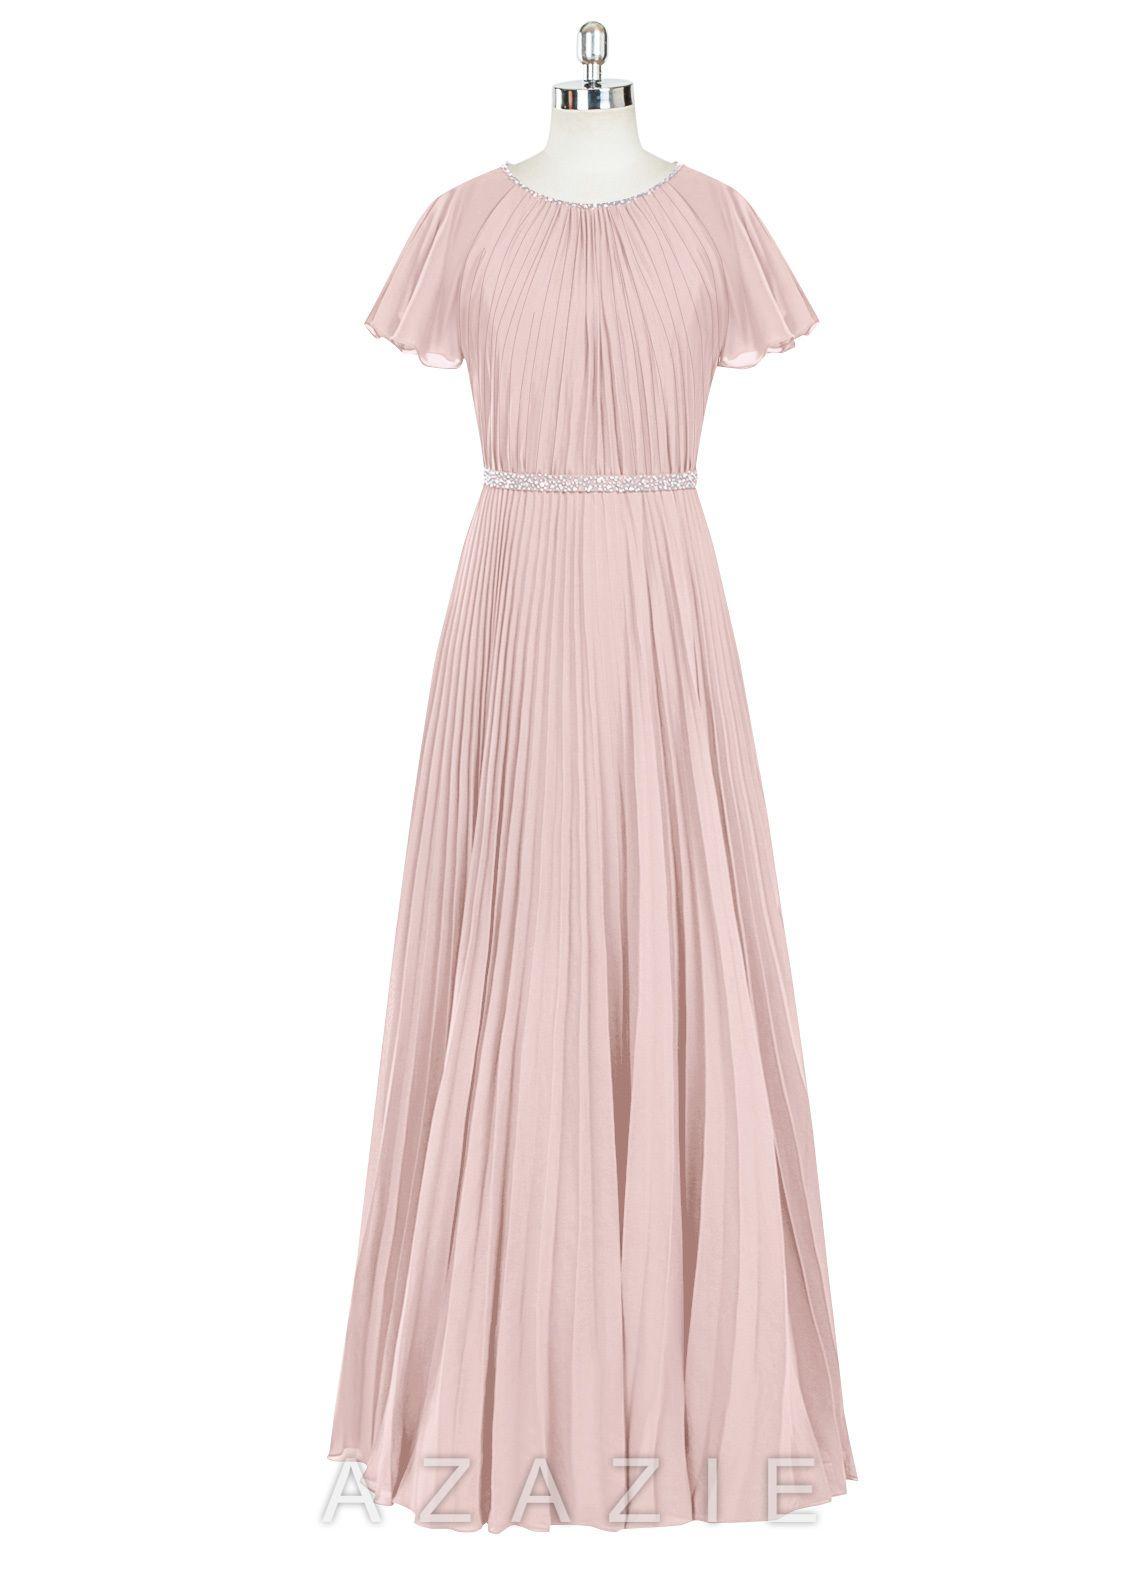 KARA - Modest Bridesmaid Dresses | Modest bridesmaid dresses, Kara ...